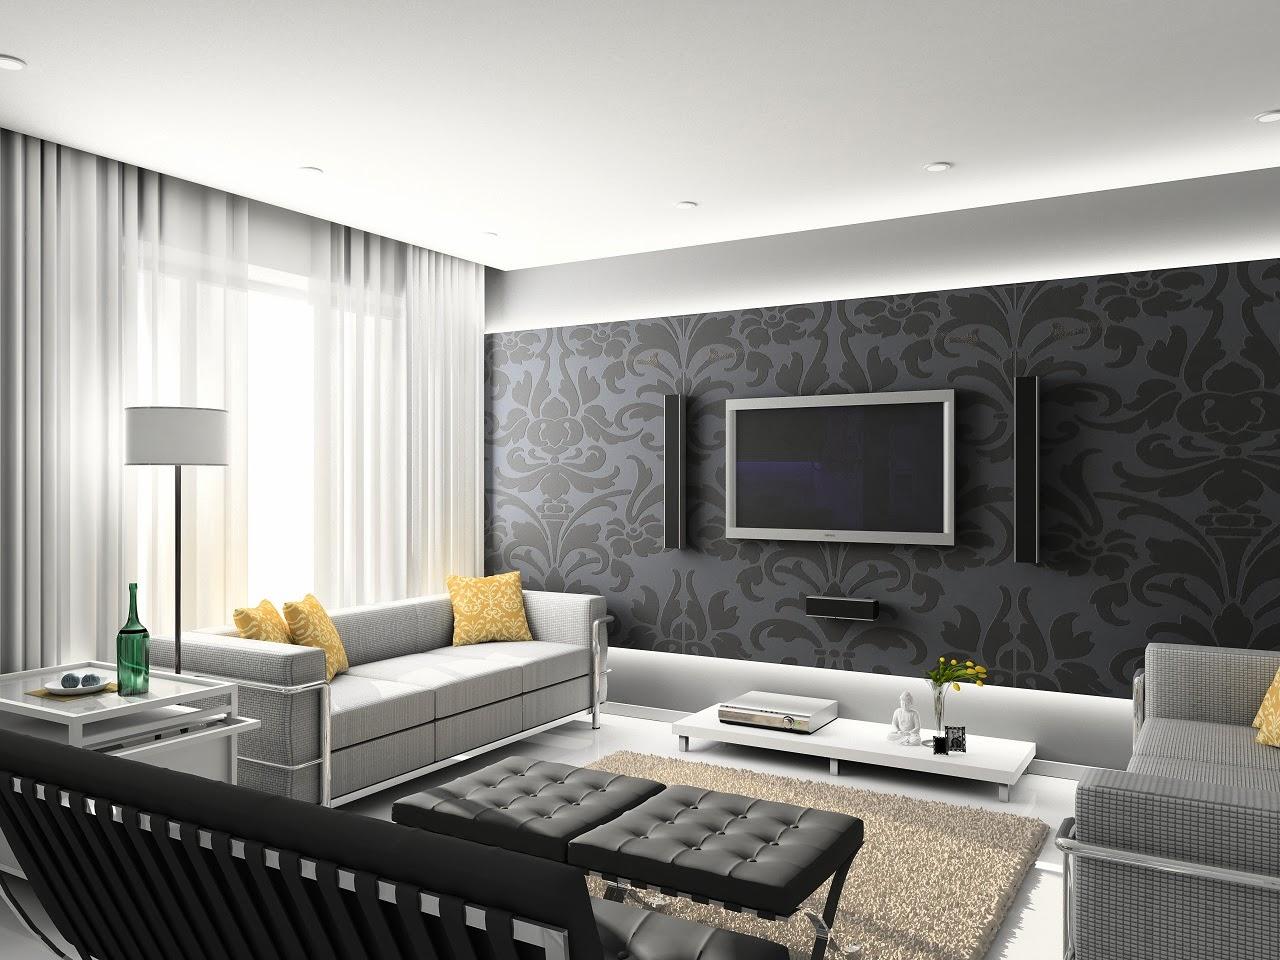 Modern Living Room Interior Design 2014 interior design 2014